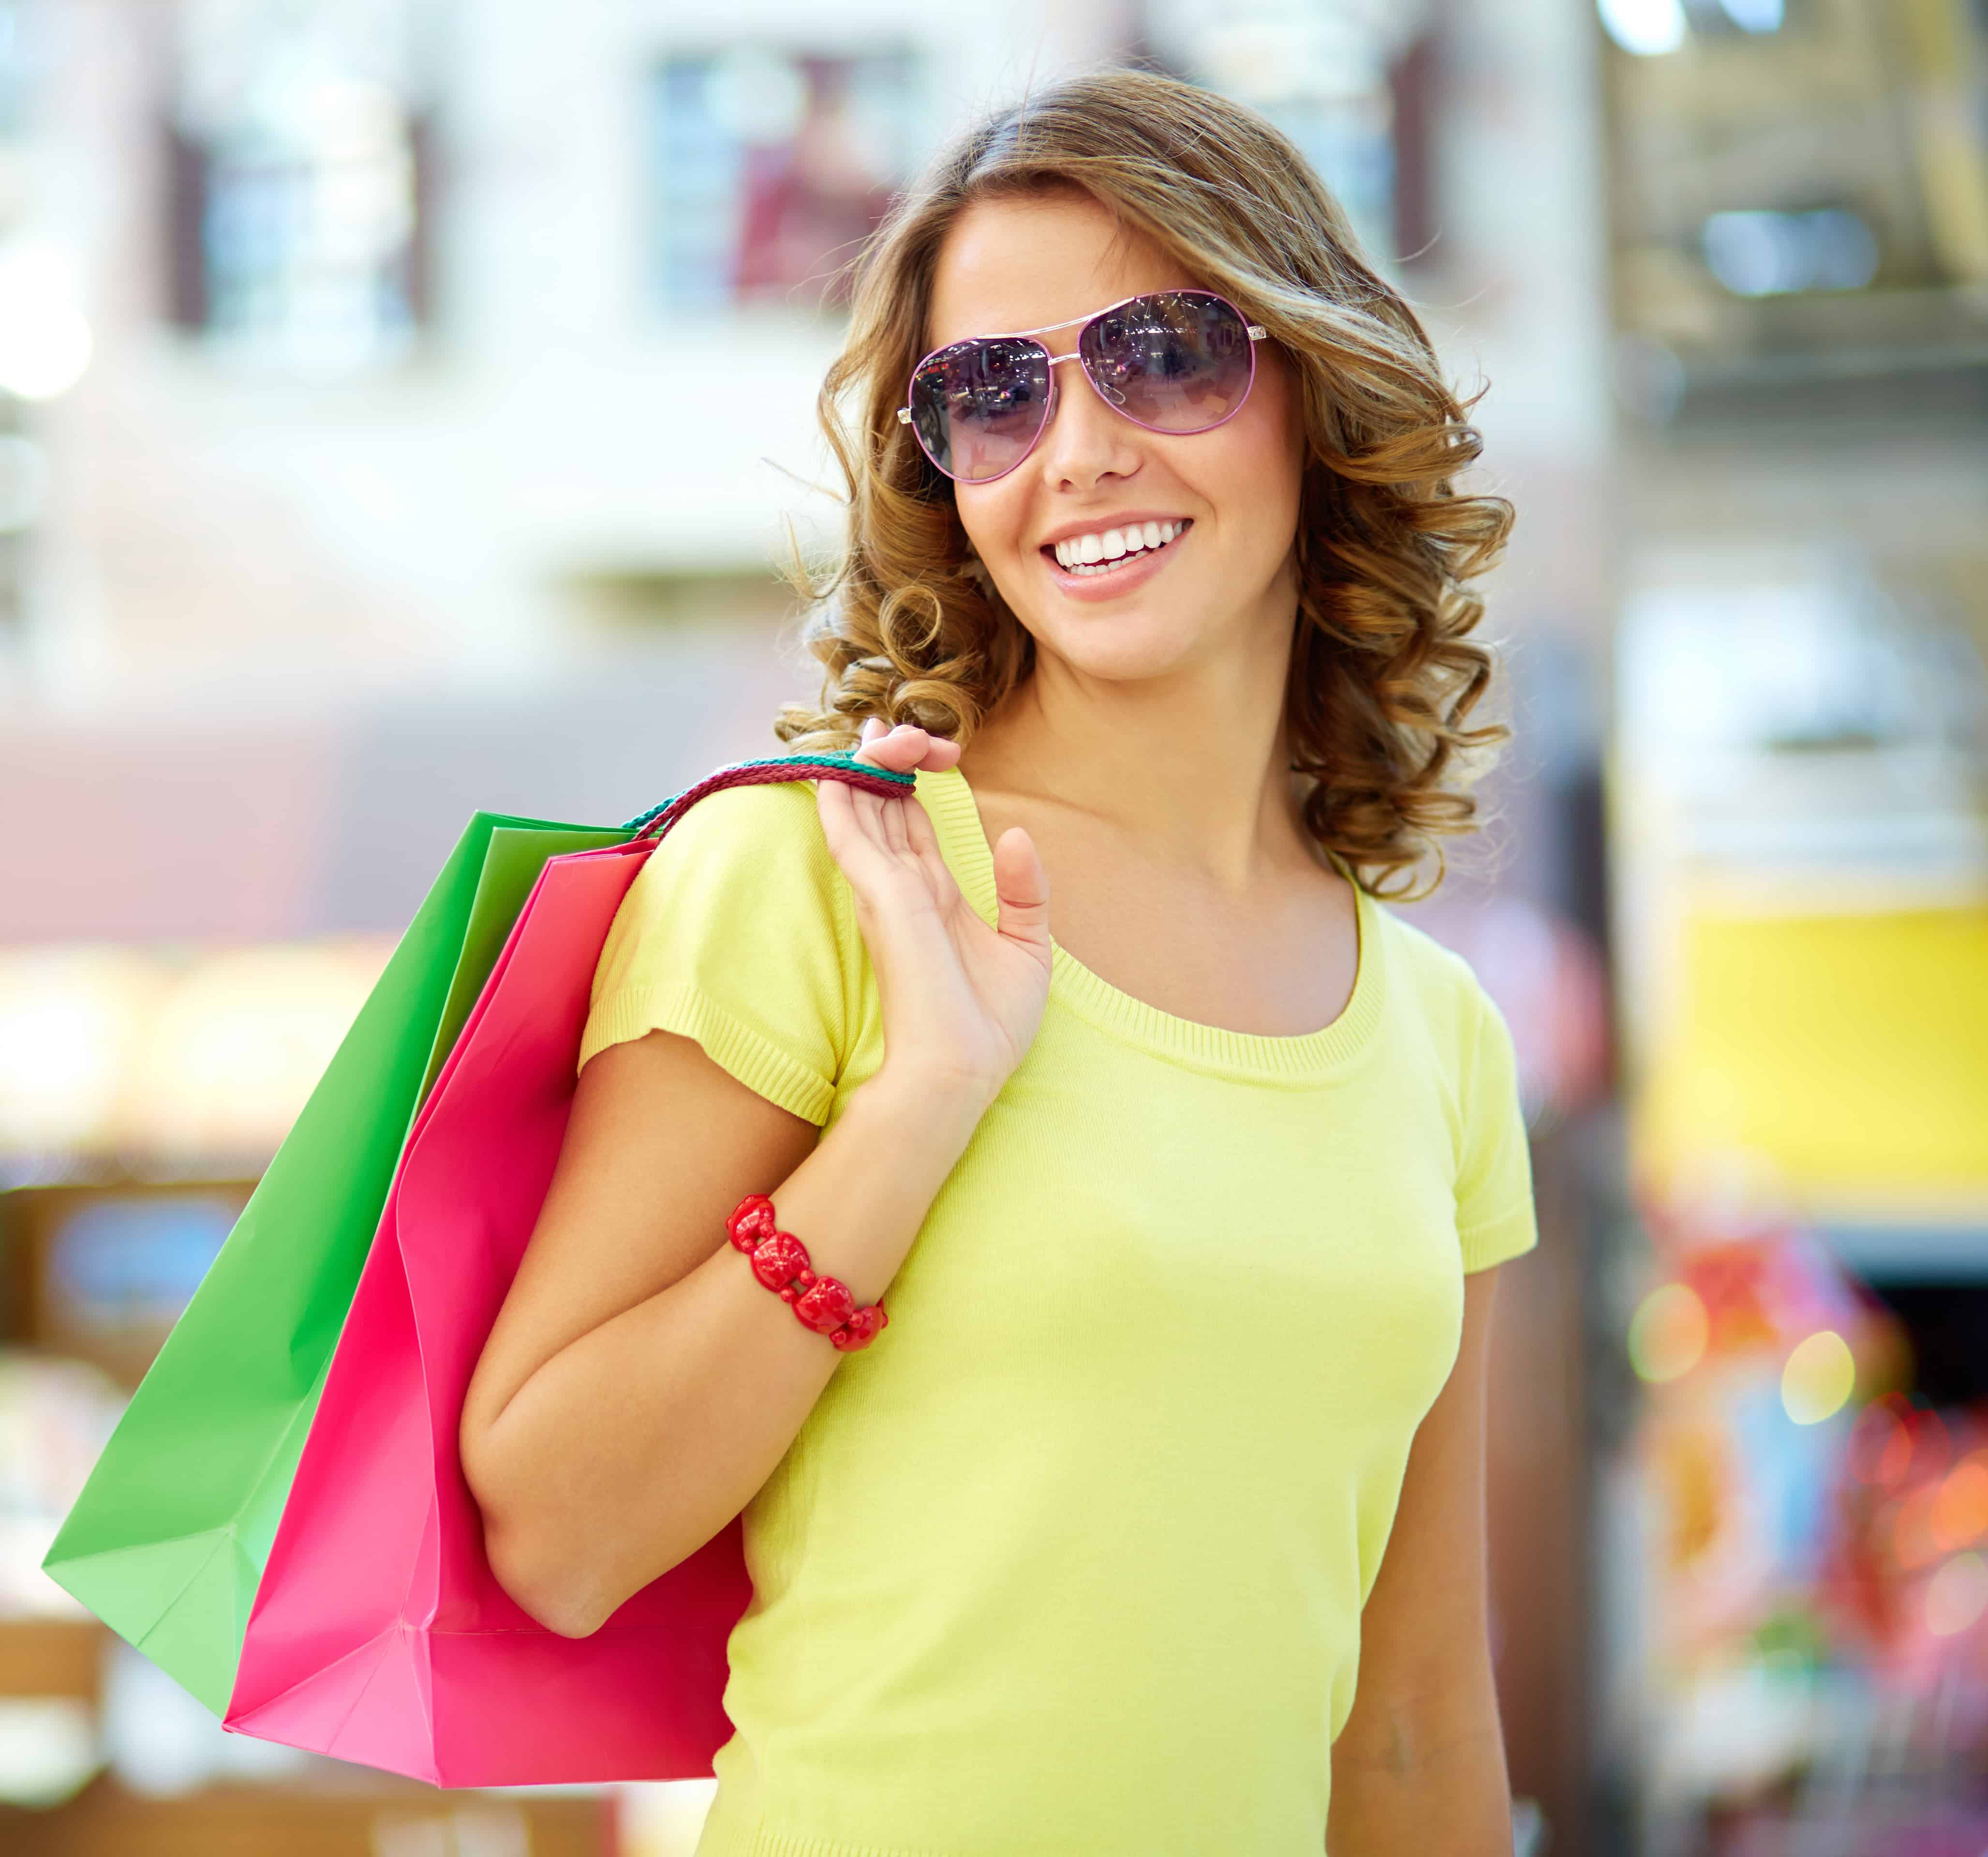 Freelance Shopping News Writer for The Zoe Report